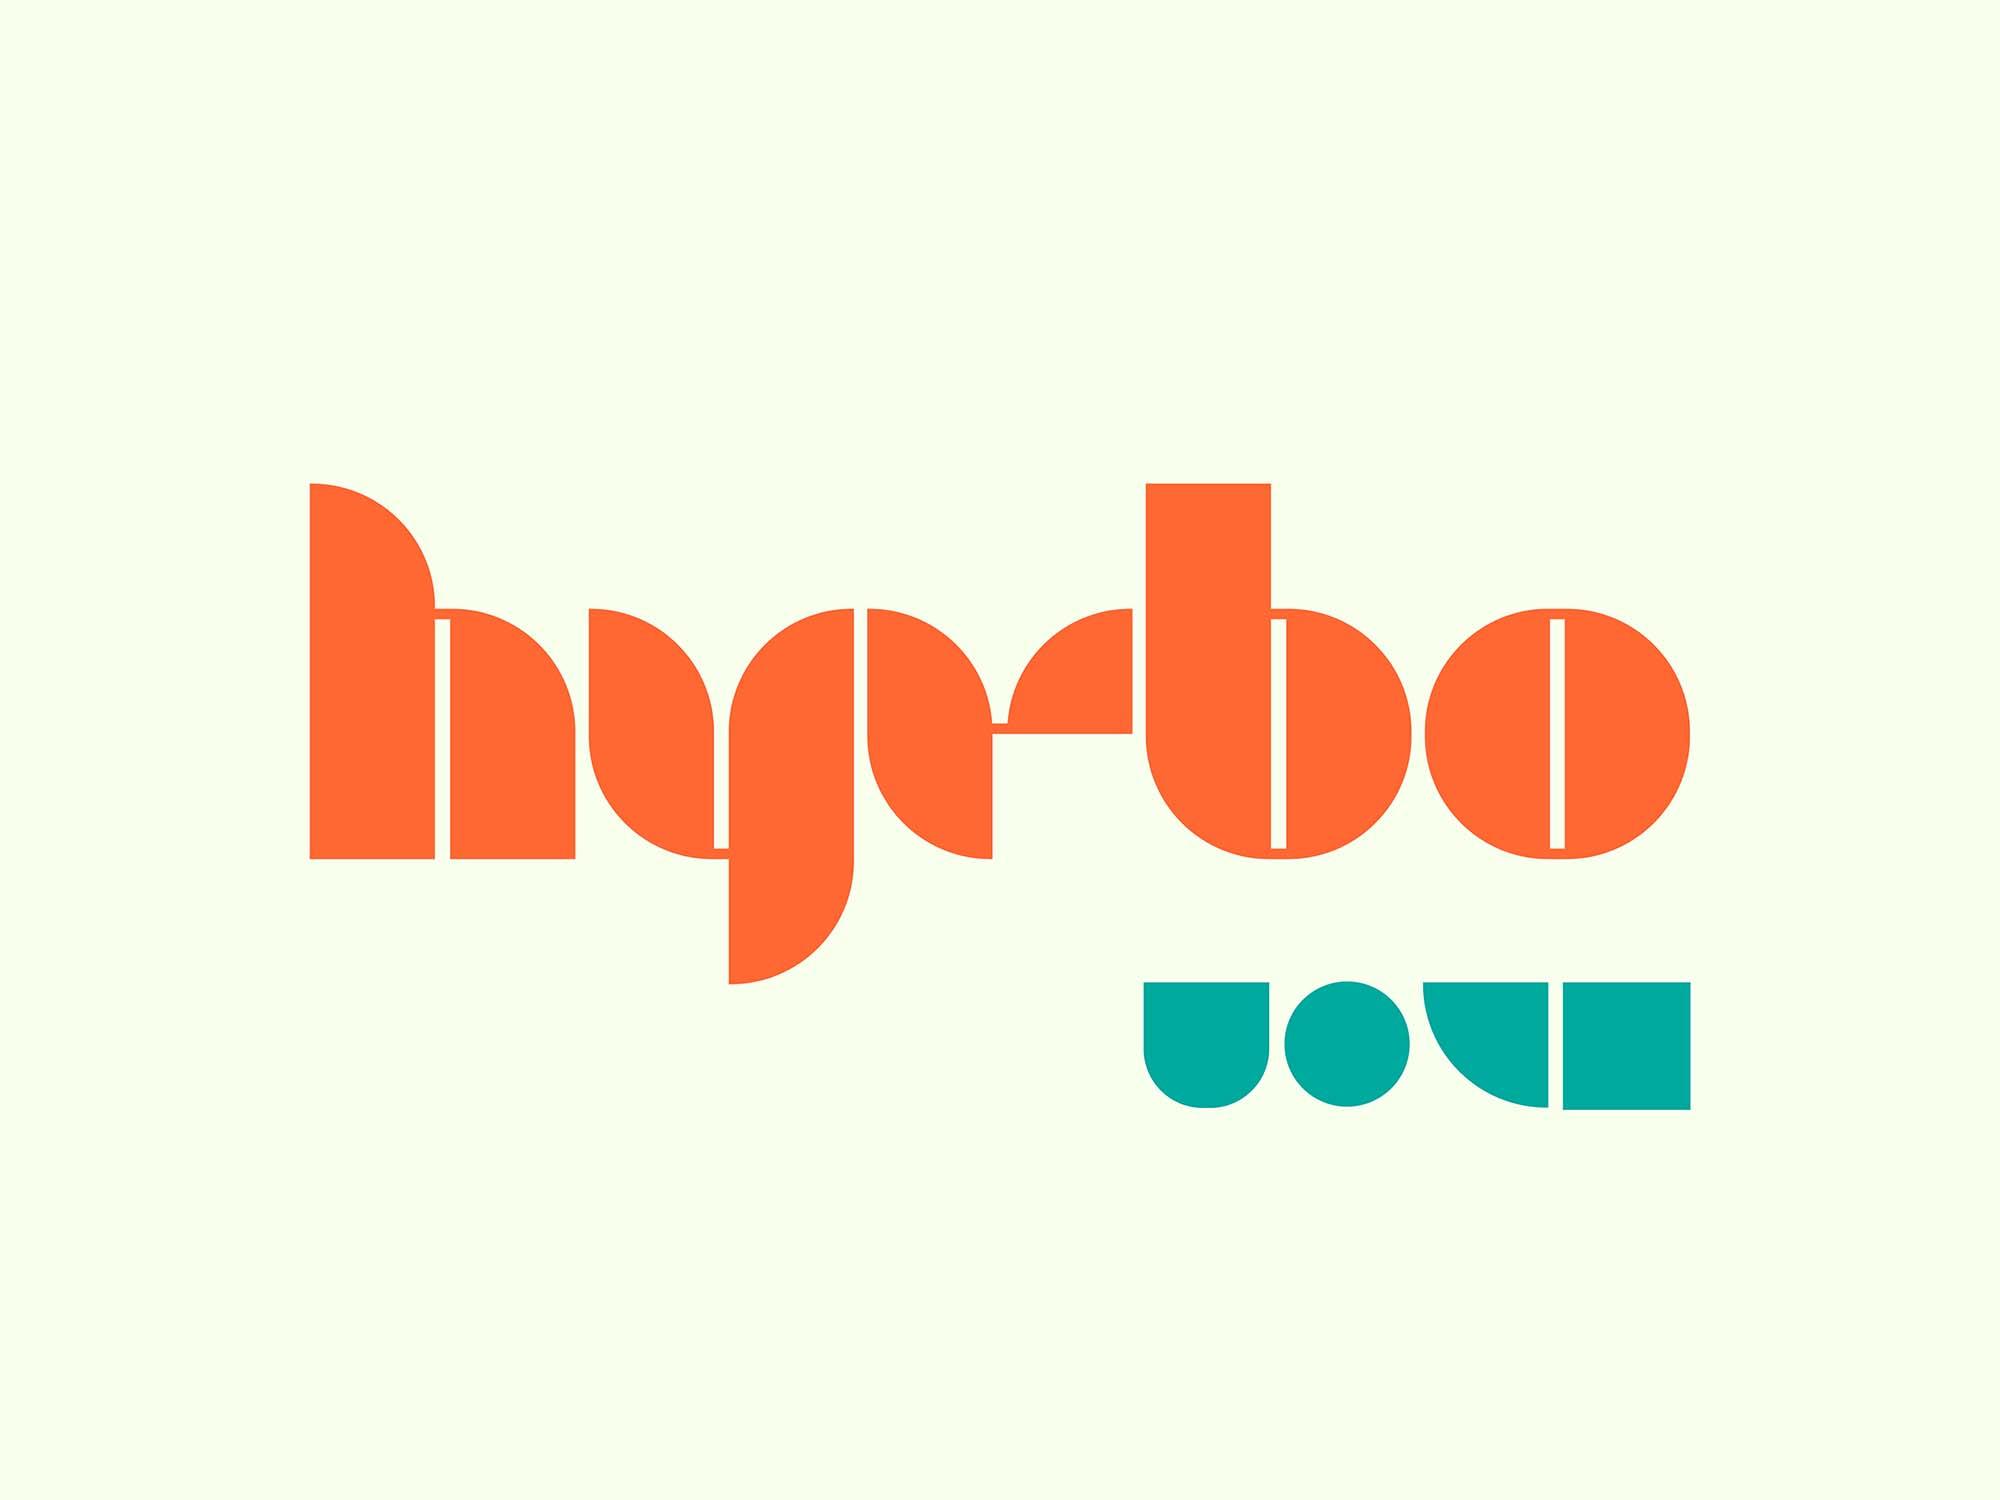 Hyrbo Display Font